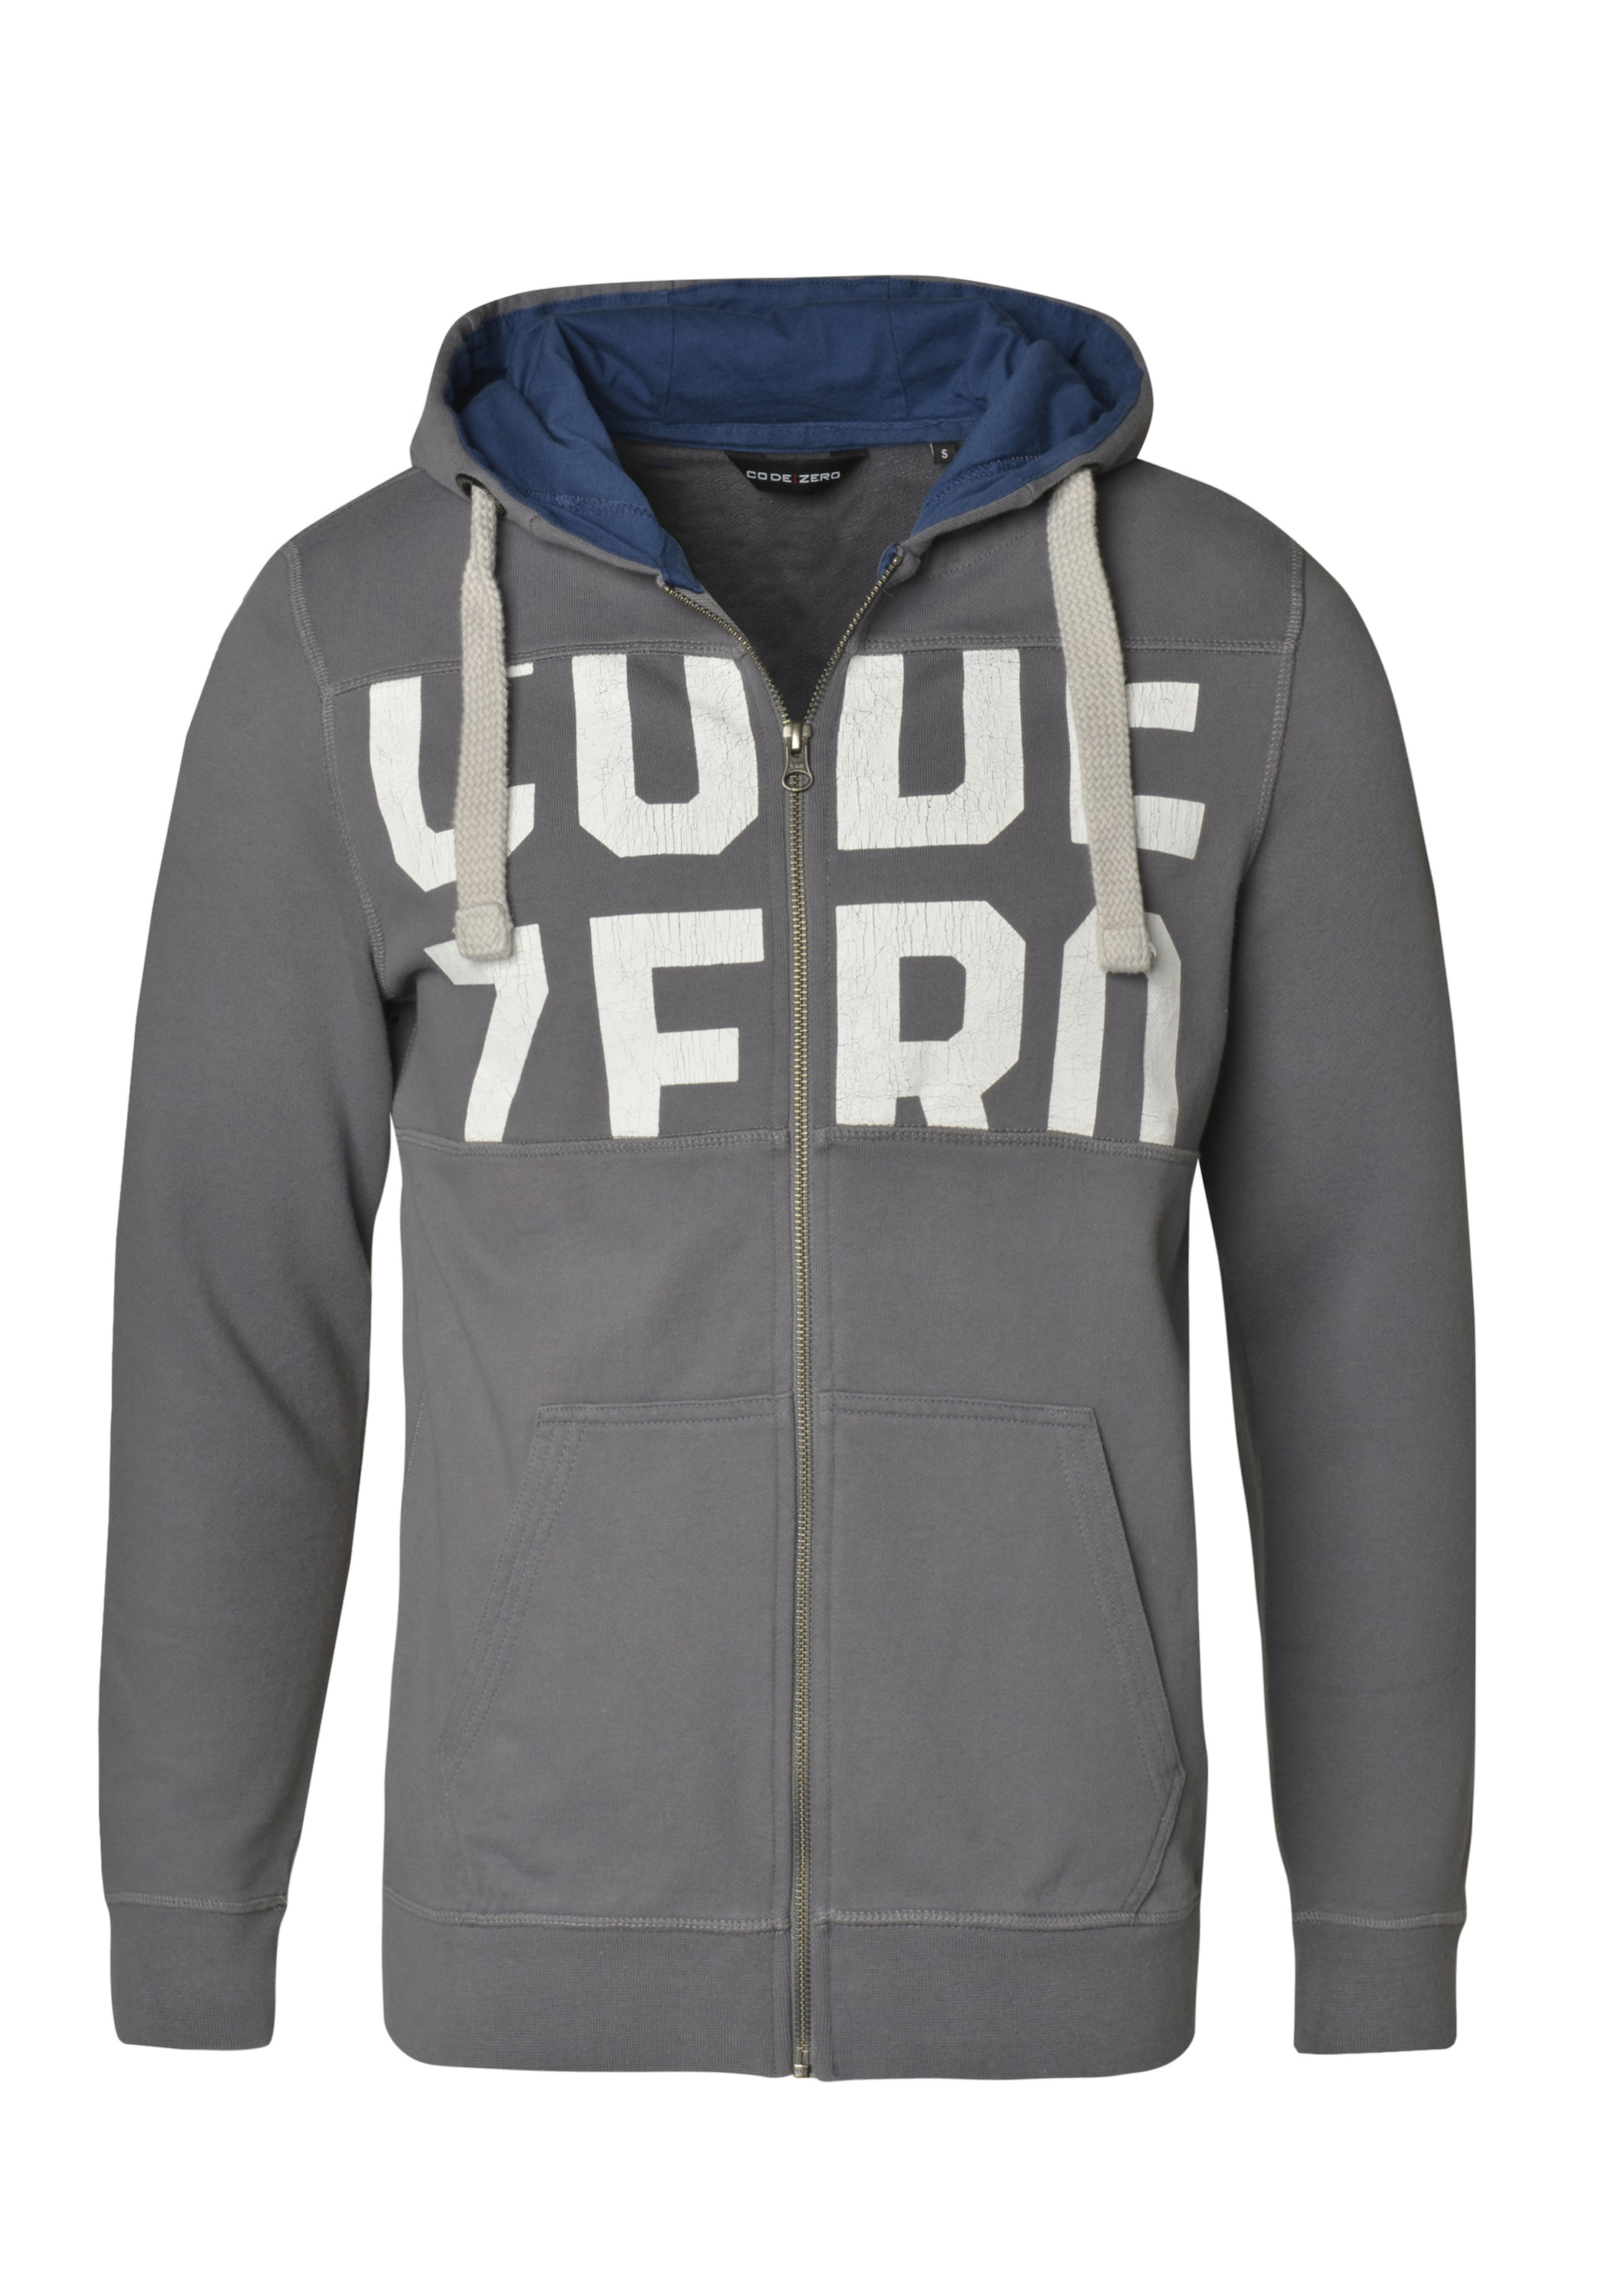 Sewn' Offwhite 'cutamp; DunkelblauStone Sweater In zero Code ARj534L